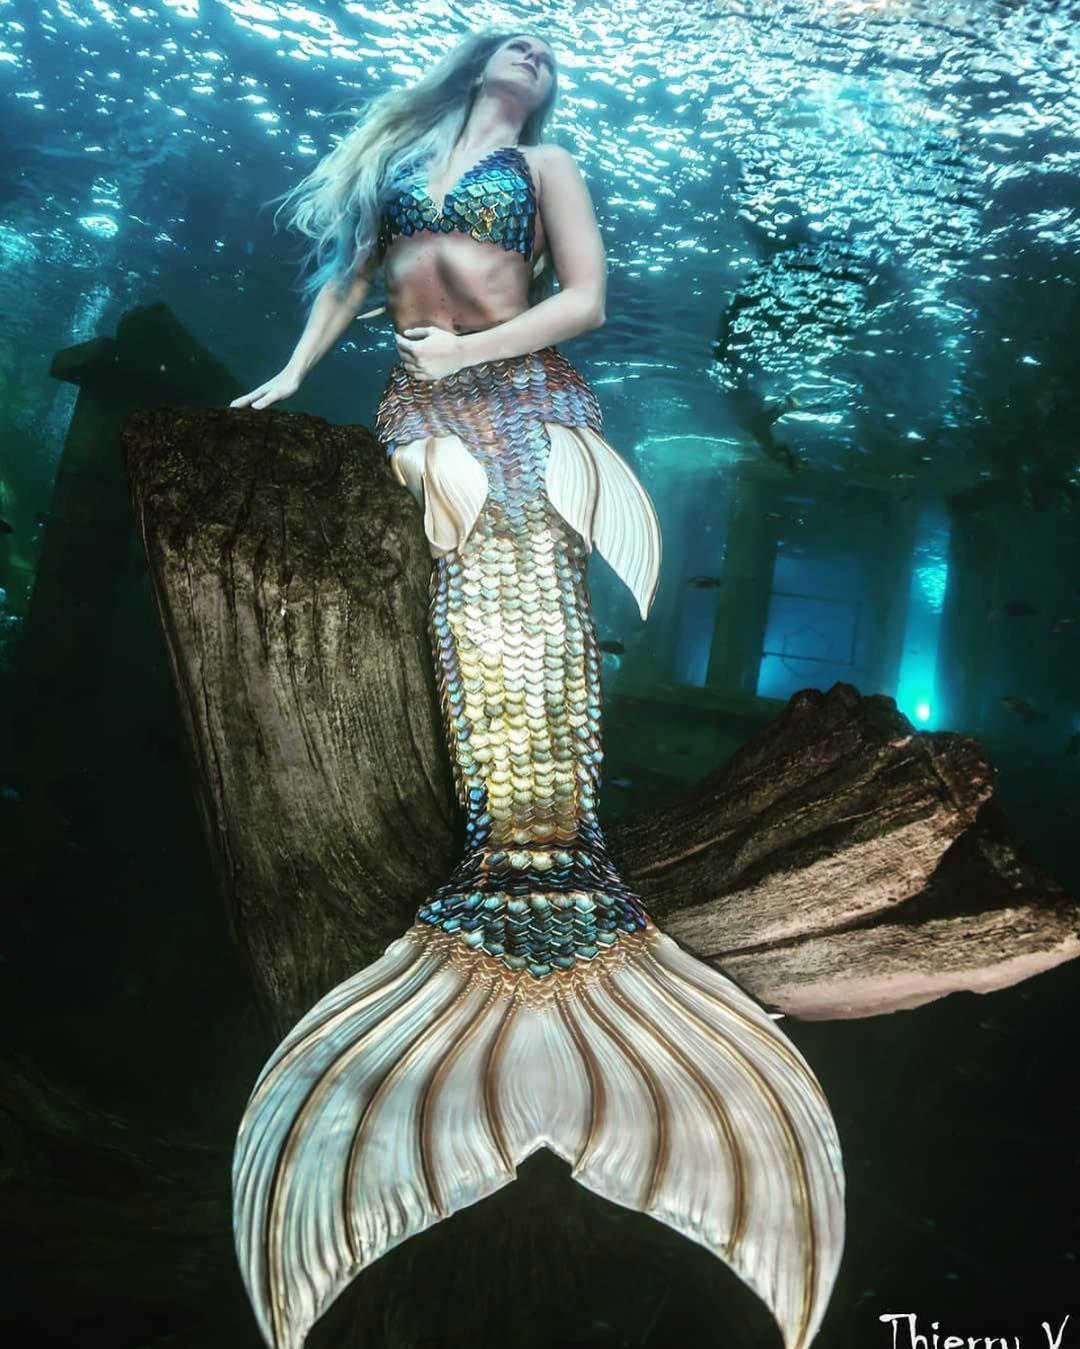 Картинки и арты русалки, феи, эльфы, ангелы (14)